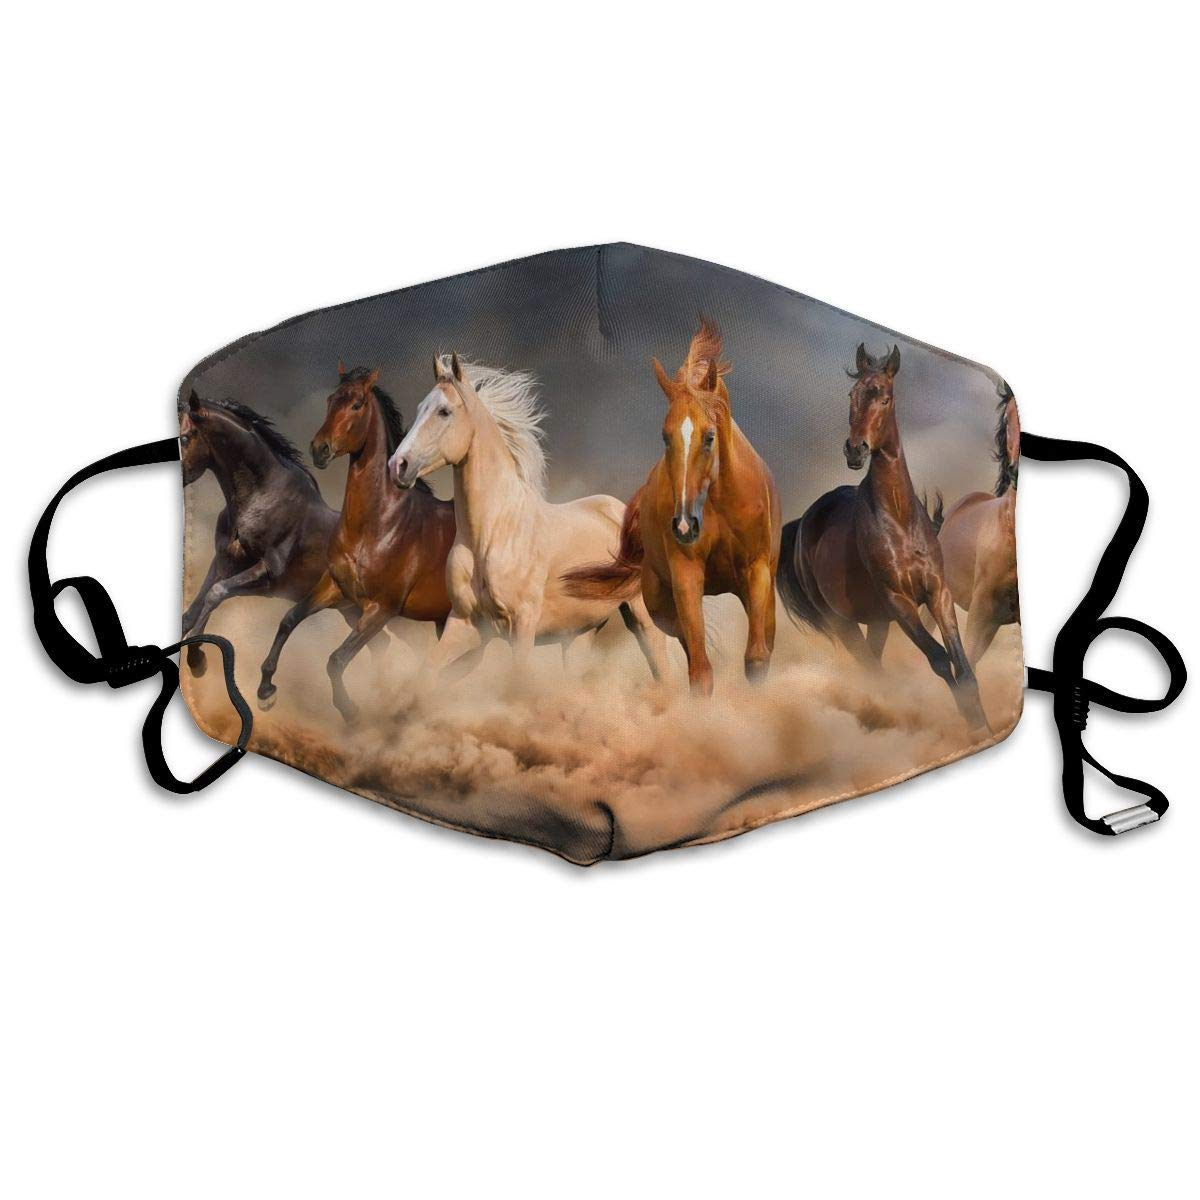 Bdwuhs Mascarillas Bucales Face Mouth Mask, Running Horse Washable Mouth Mask Half Face Mouth Mask for Men Women White